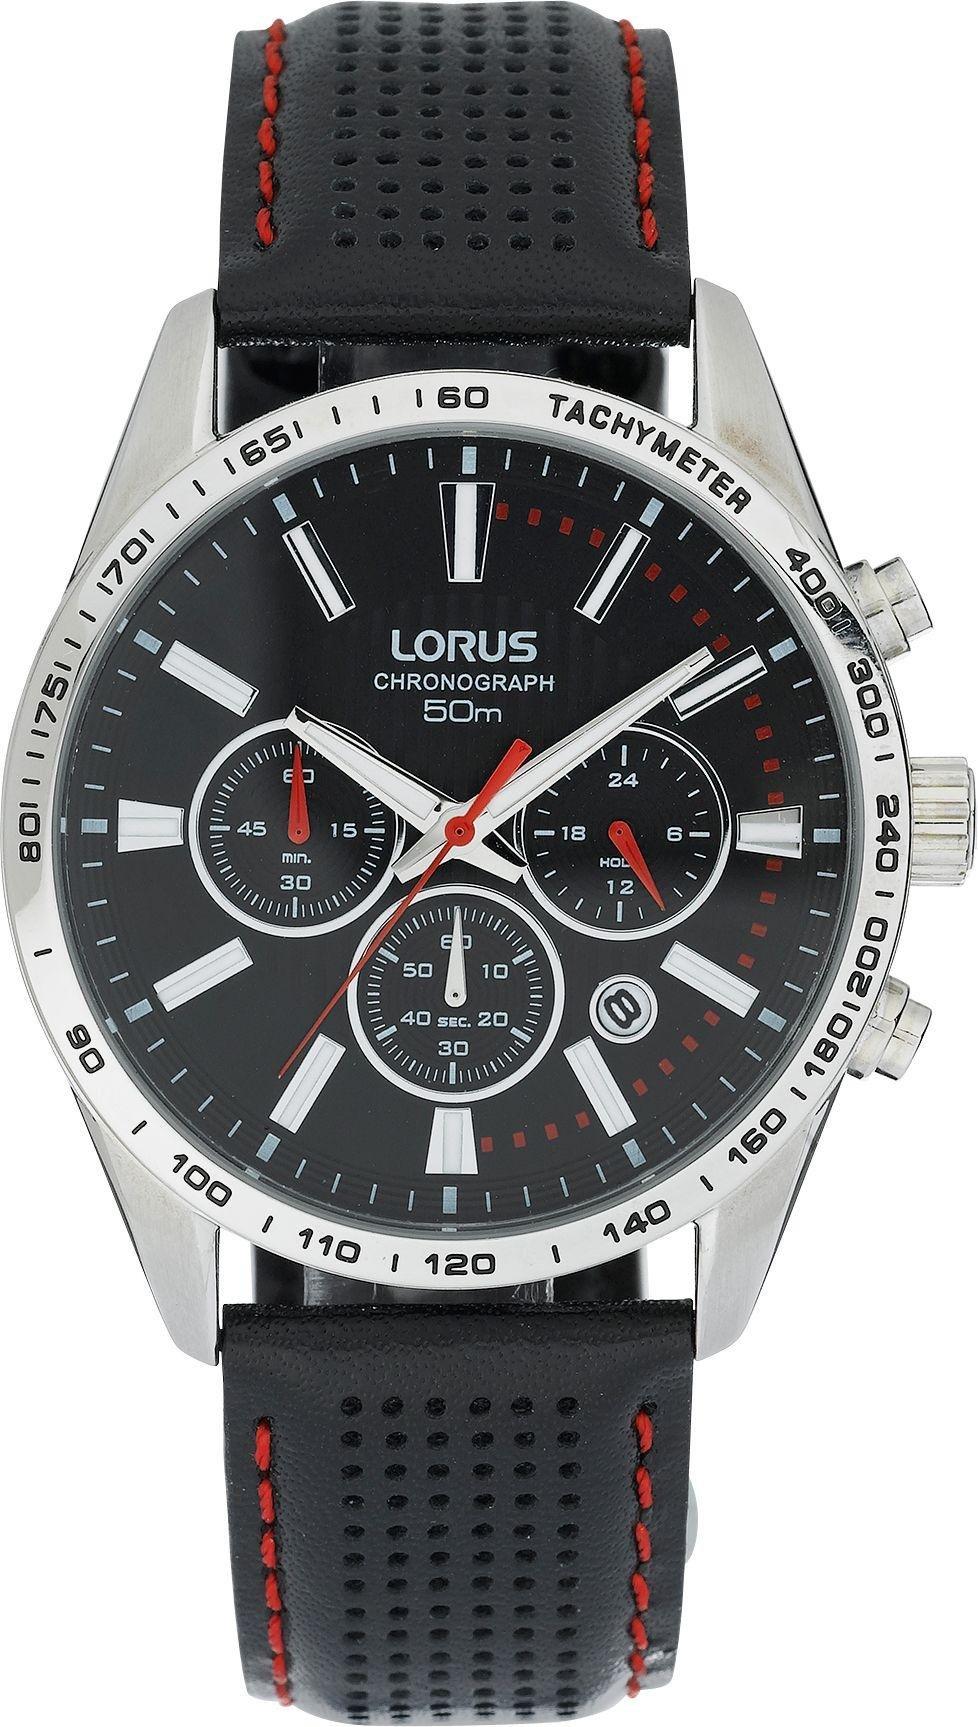 Lorus Men's Black Leather Strap Chronograph Watch